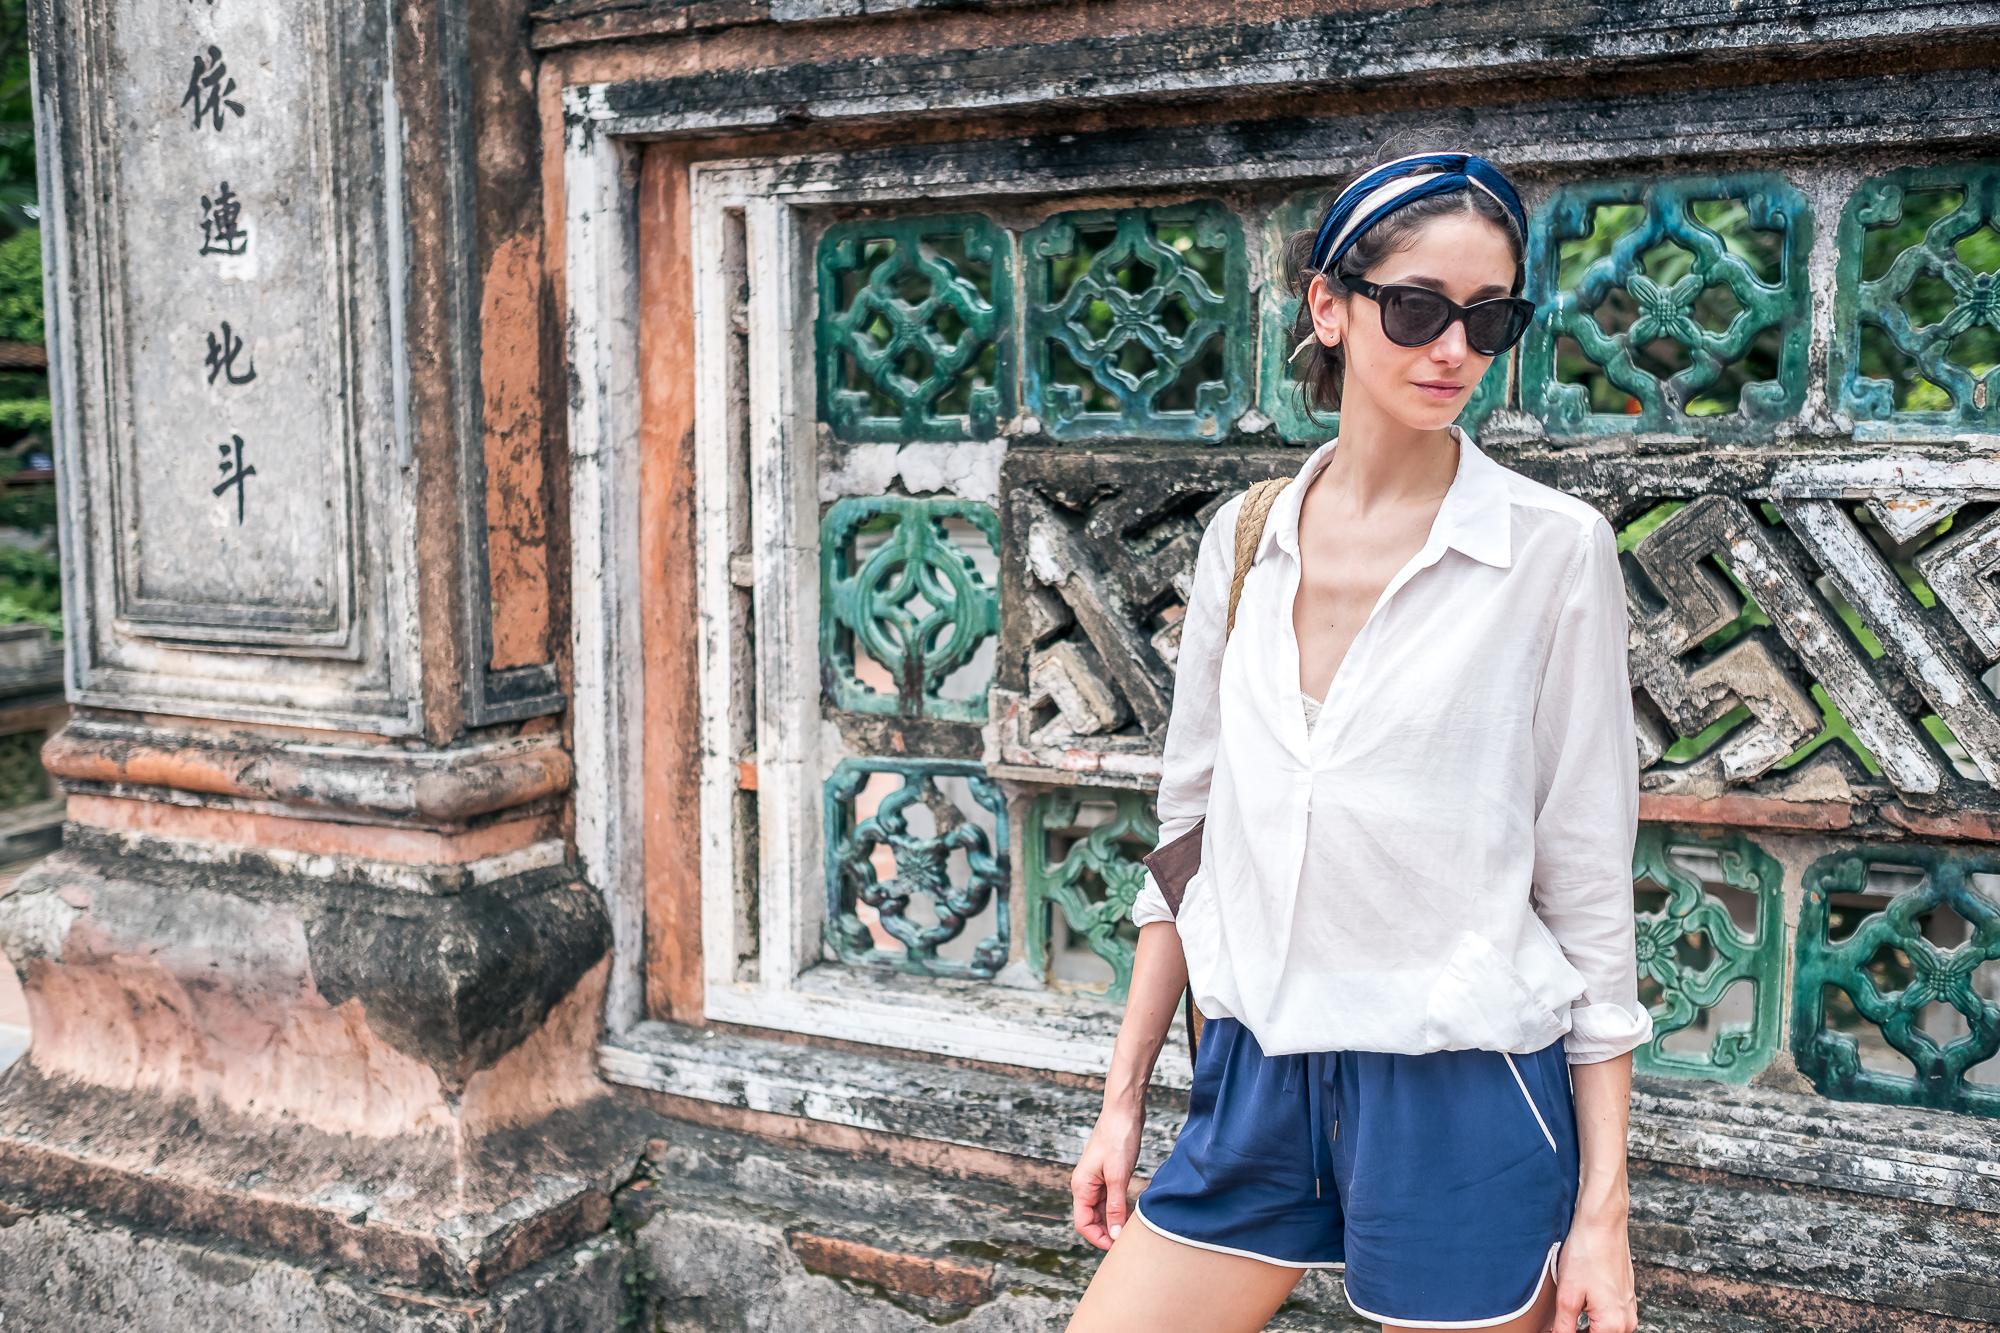 Vietnam_Honeymoon_TheOutsiderBlog_DSCF8640.JPG